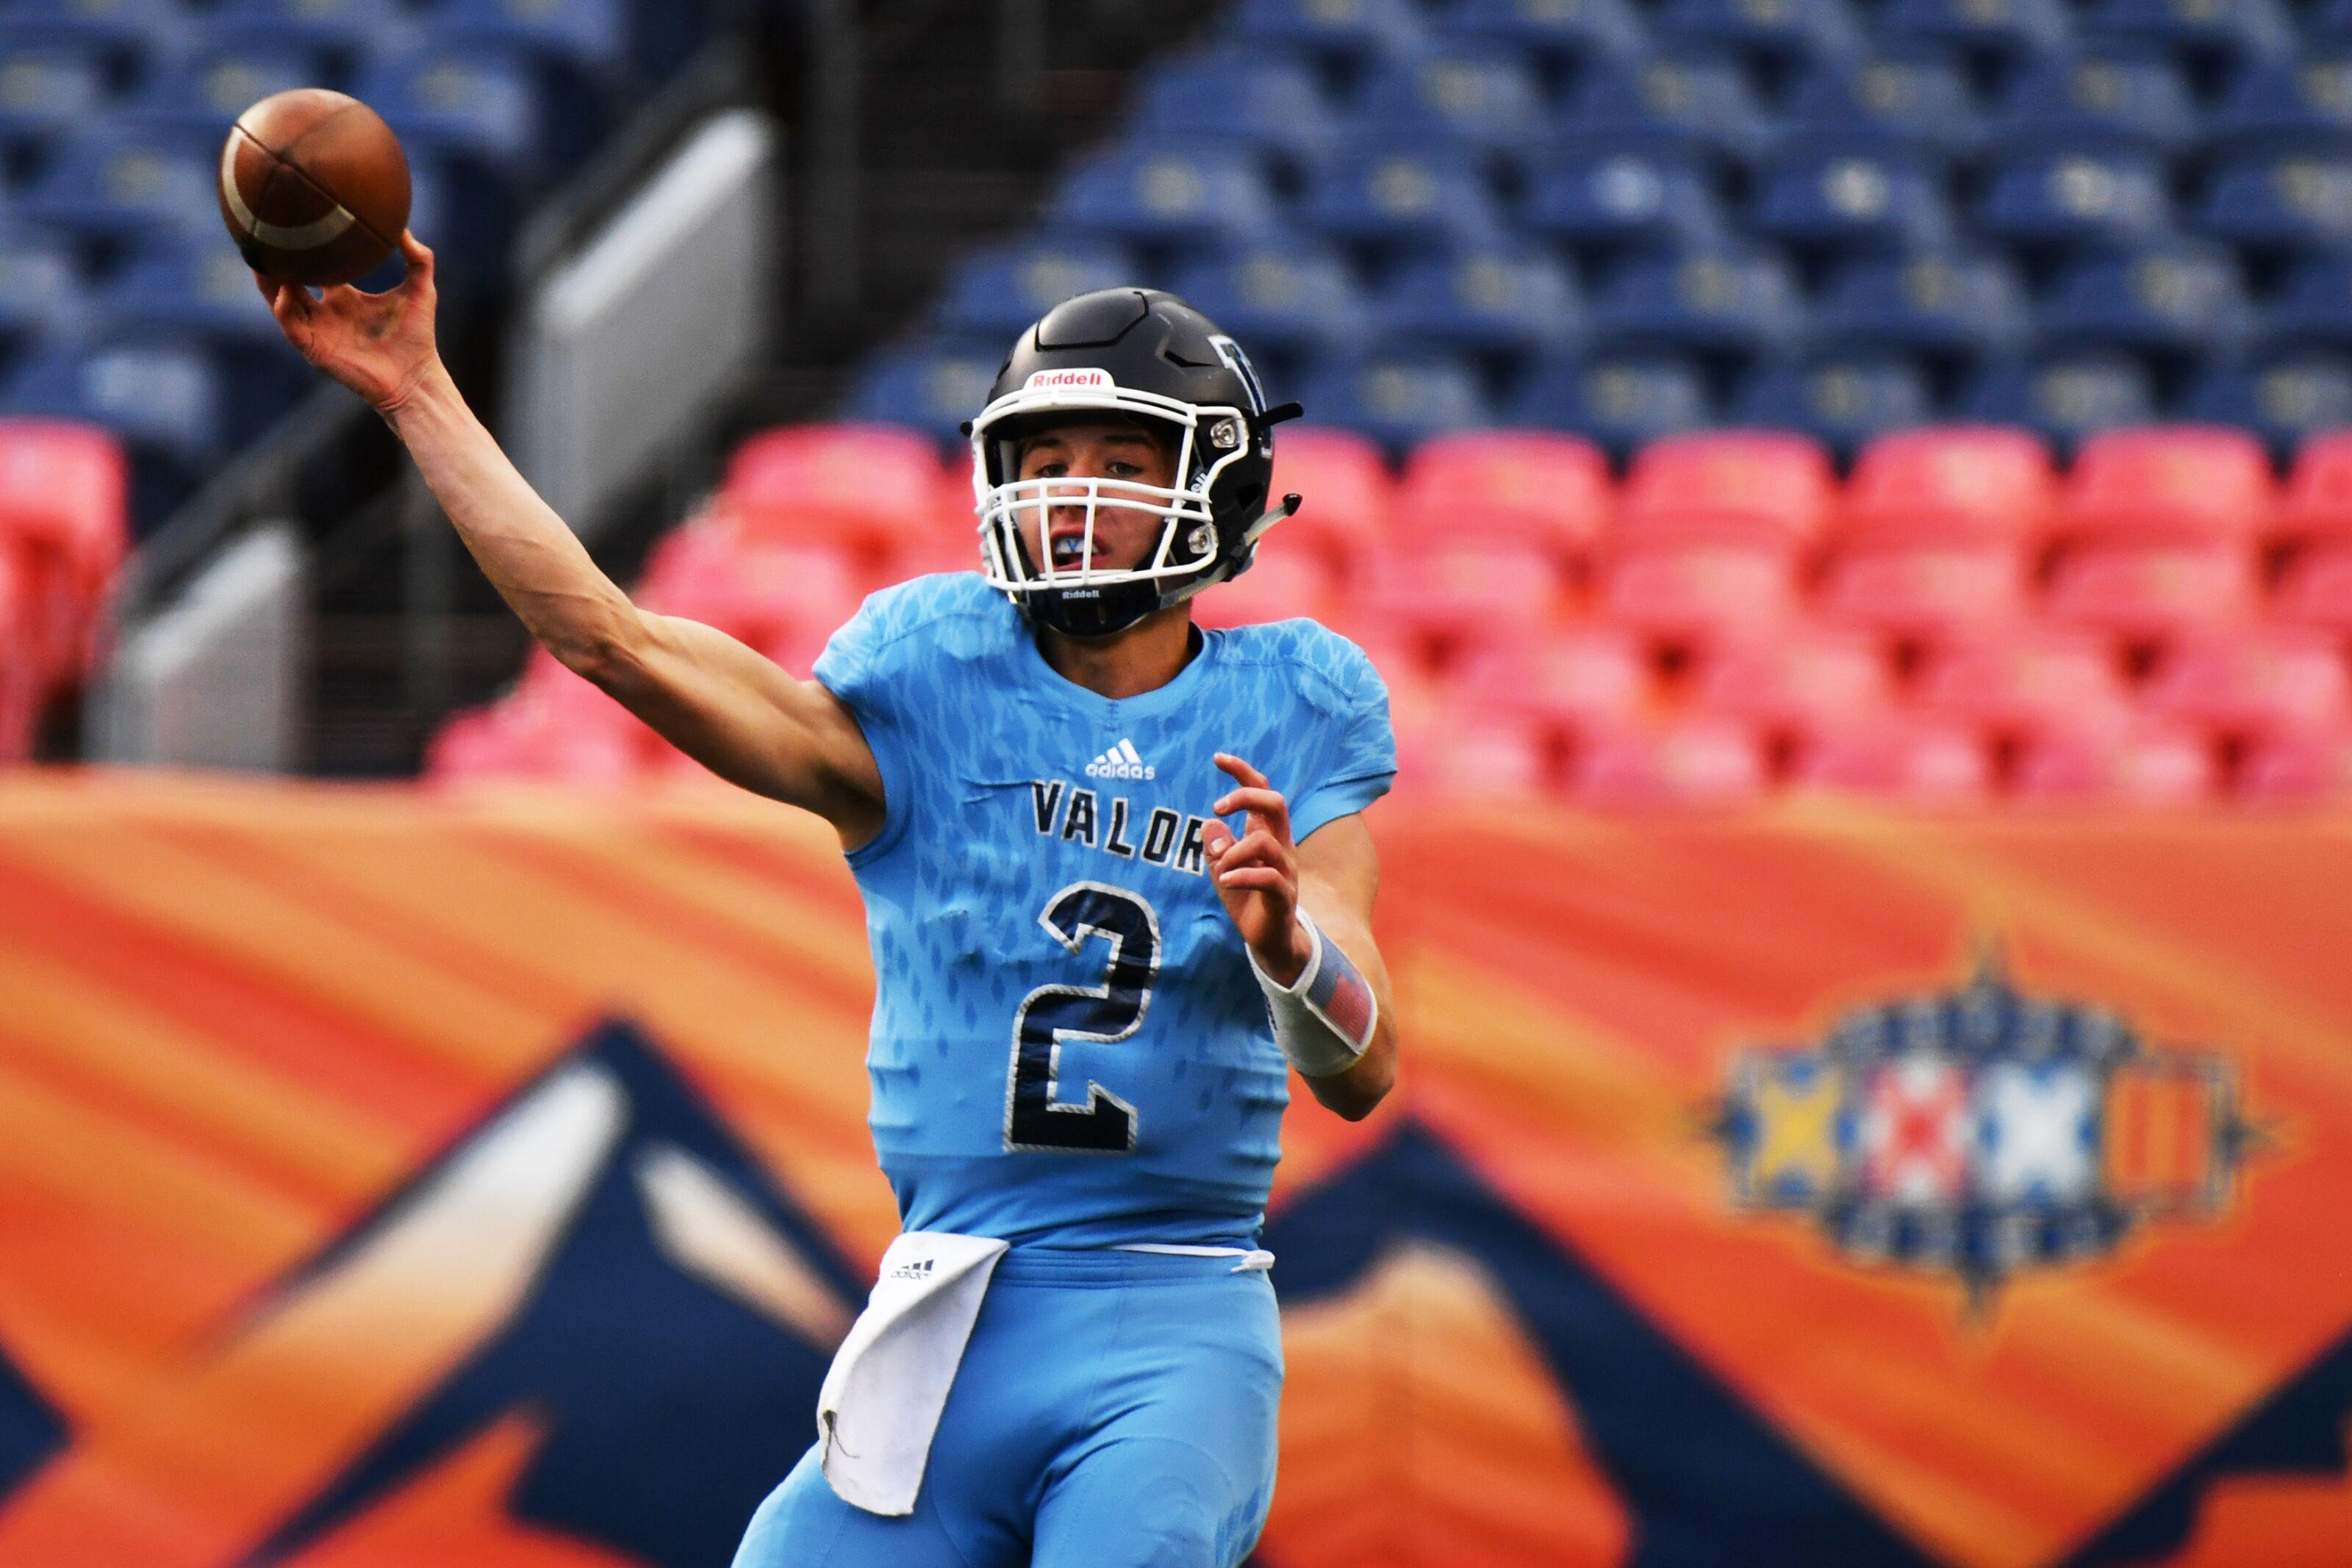 Nebraska Football: 3 key takeaways from 2019 recruiting class